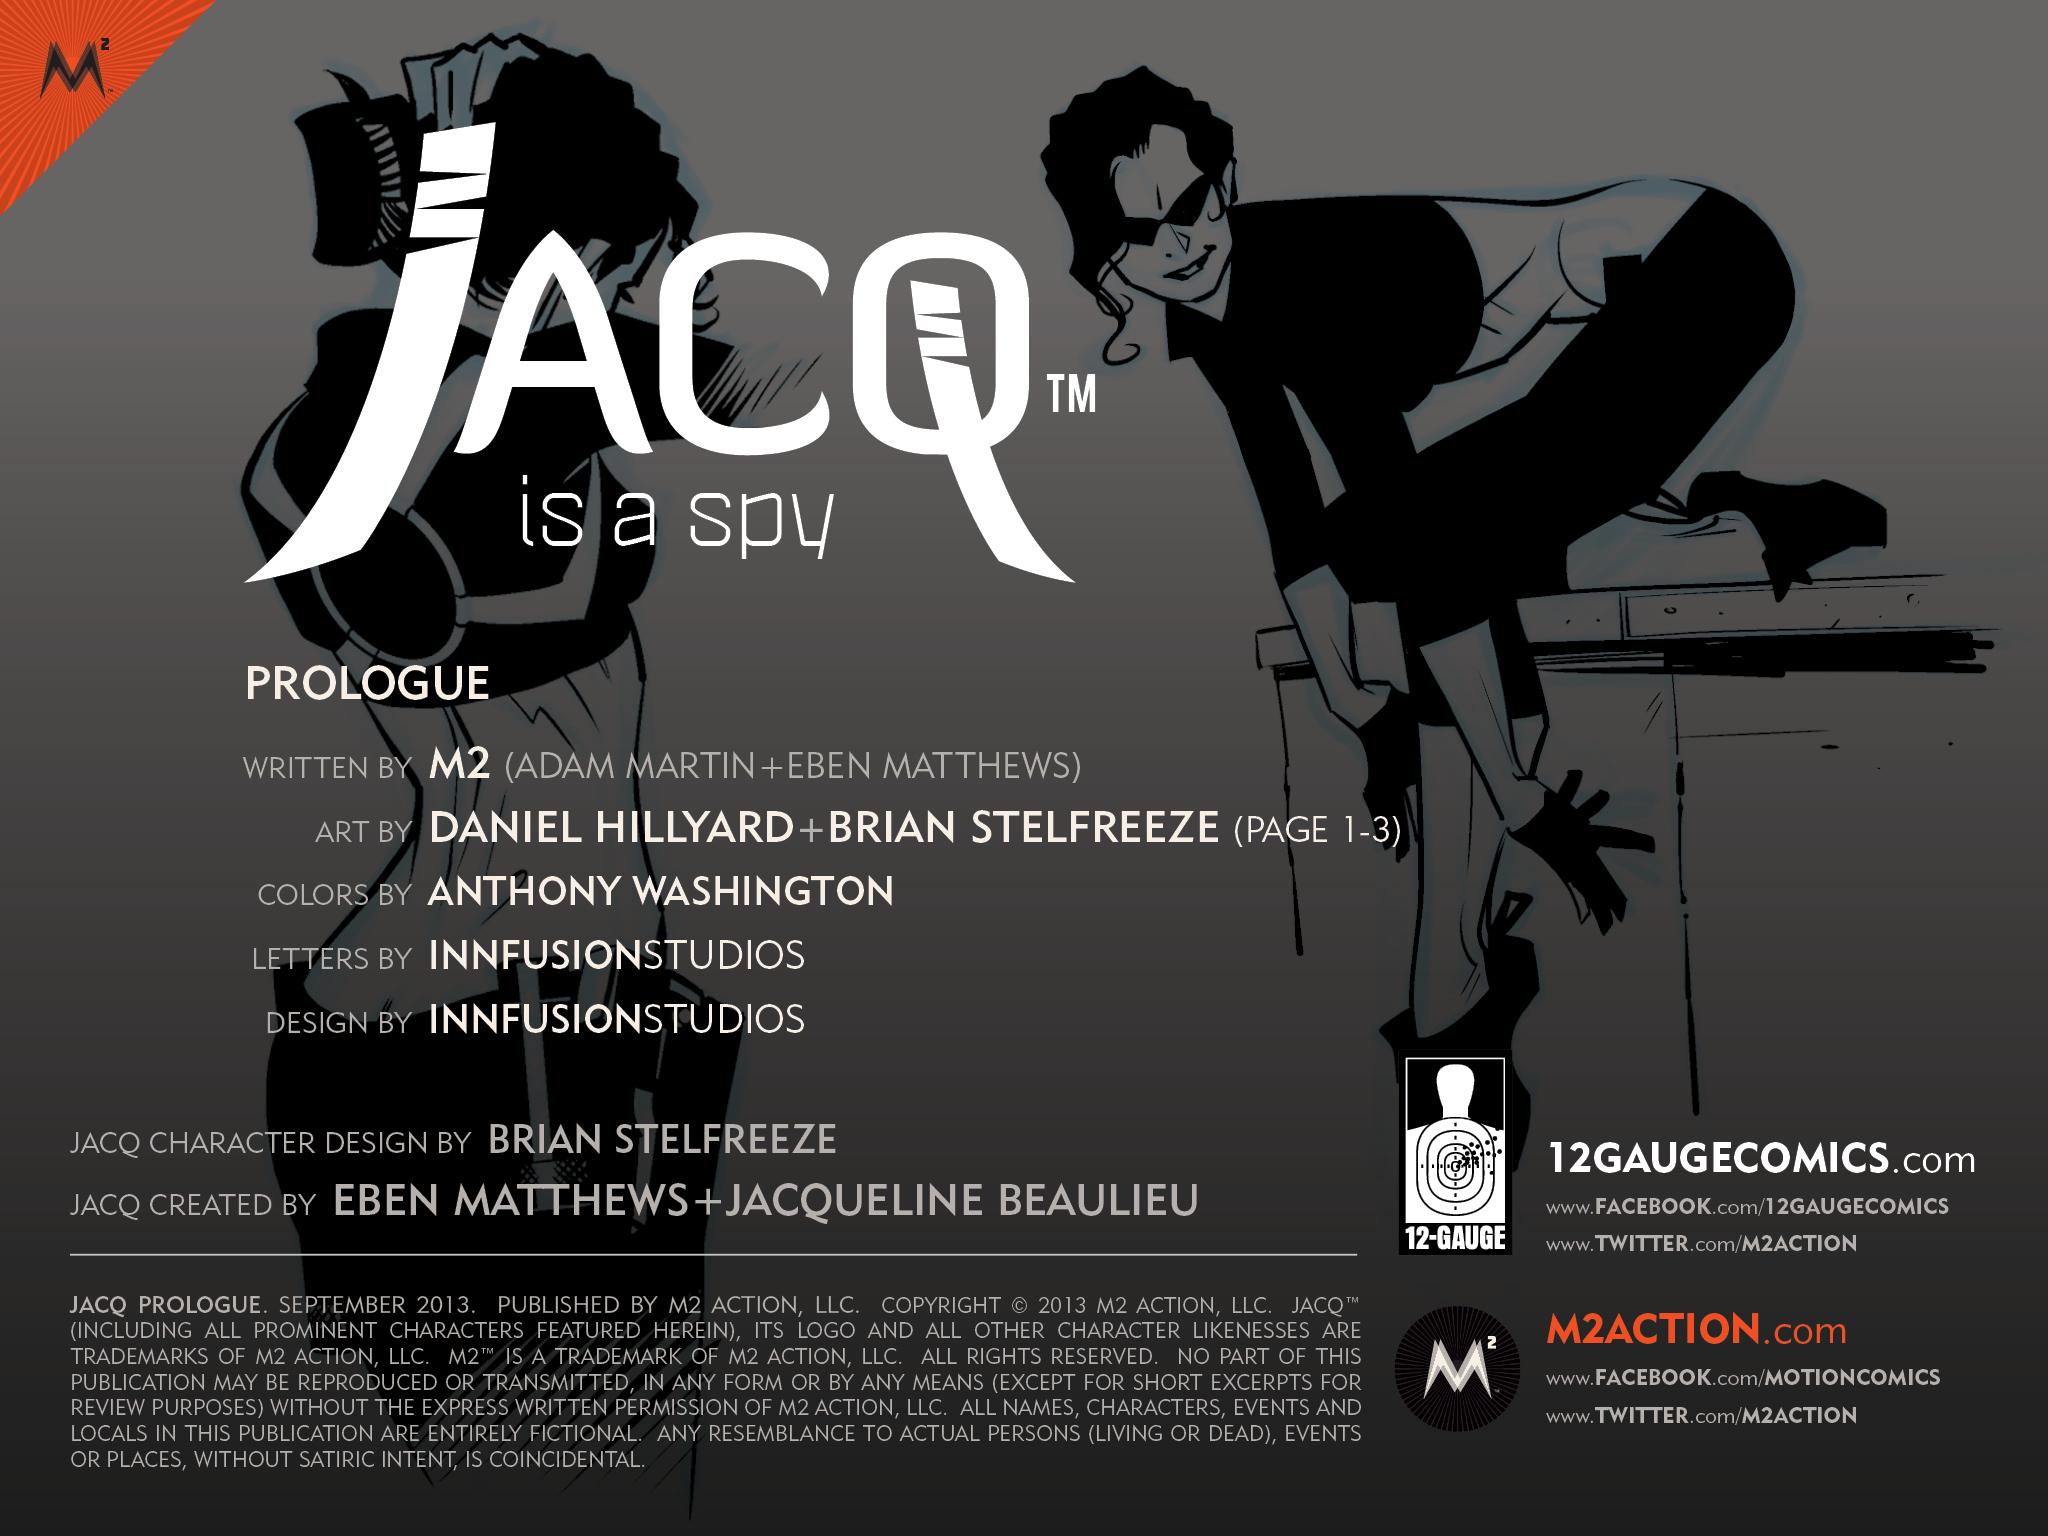 Jacq_Prologue16.jpg